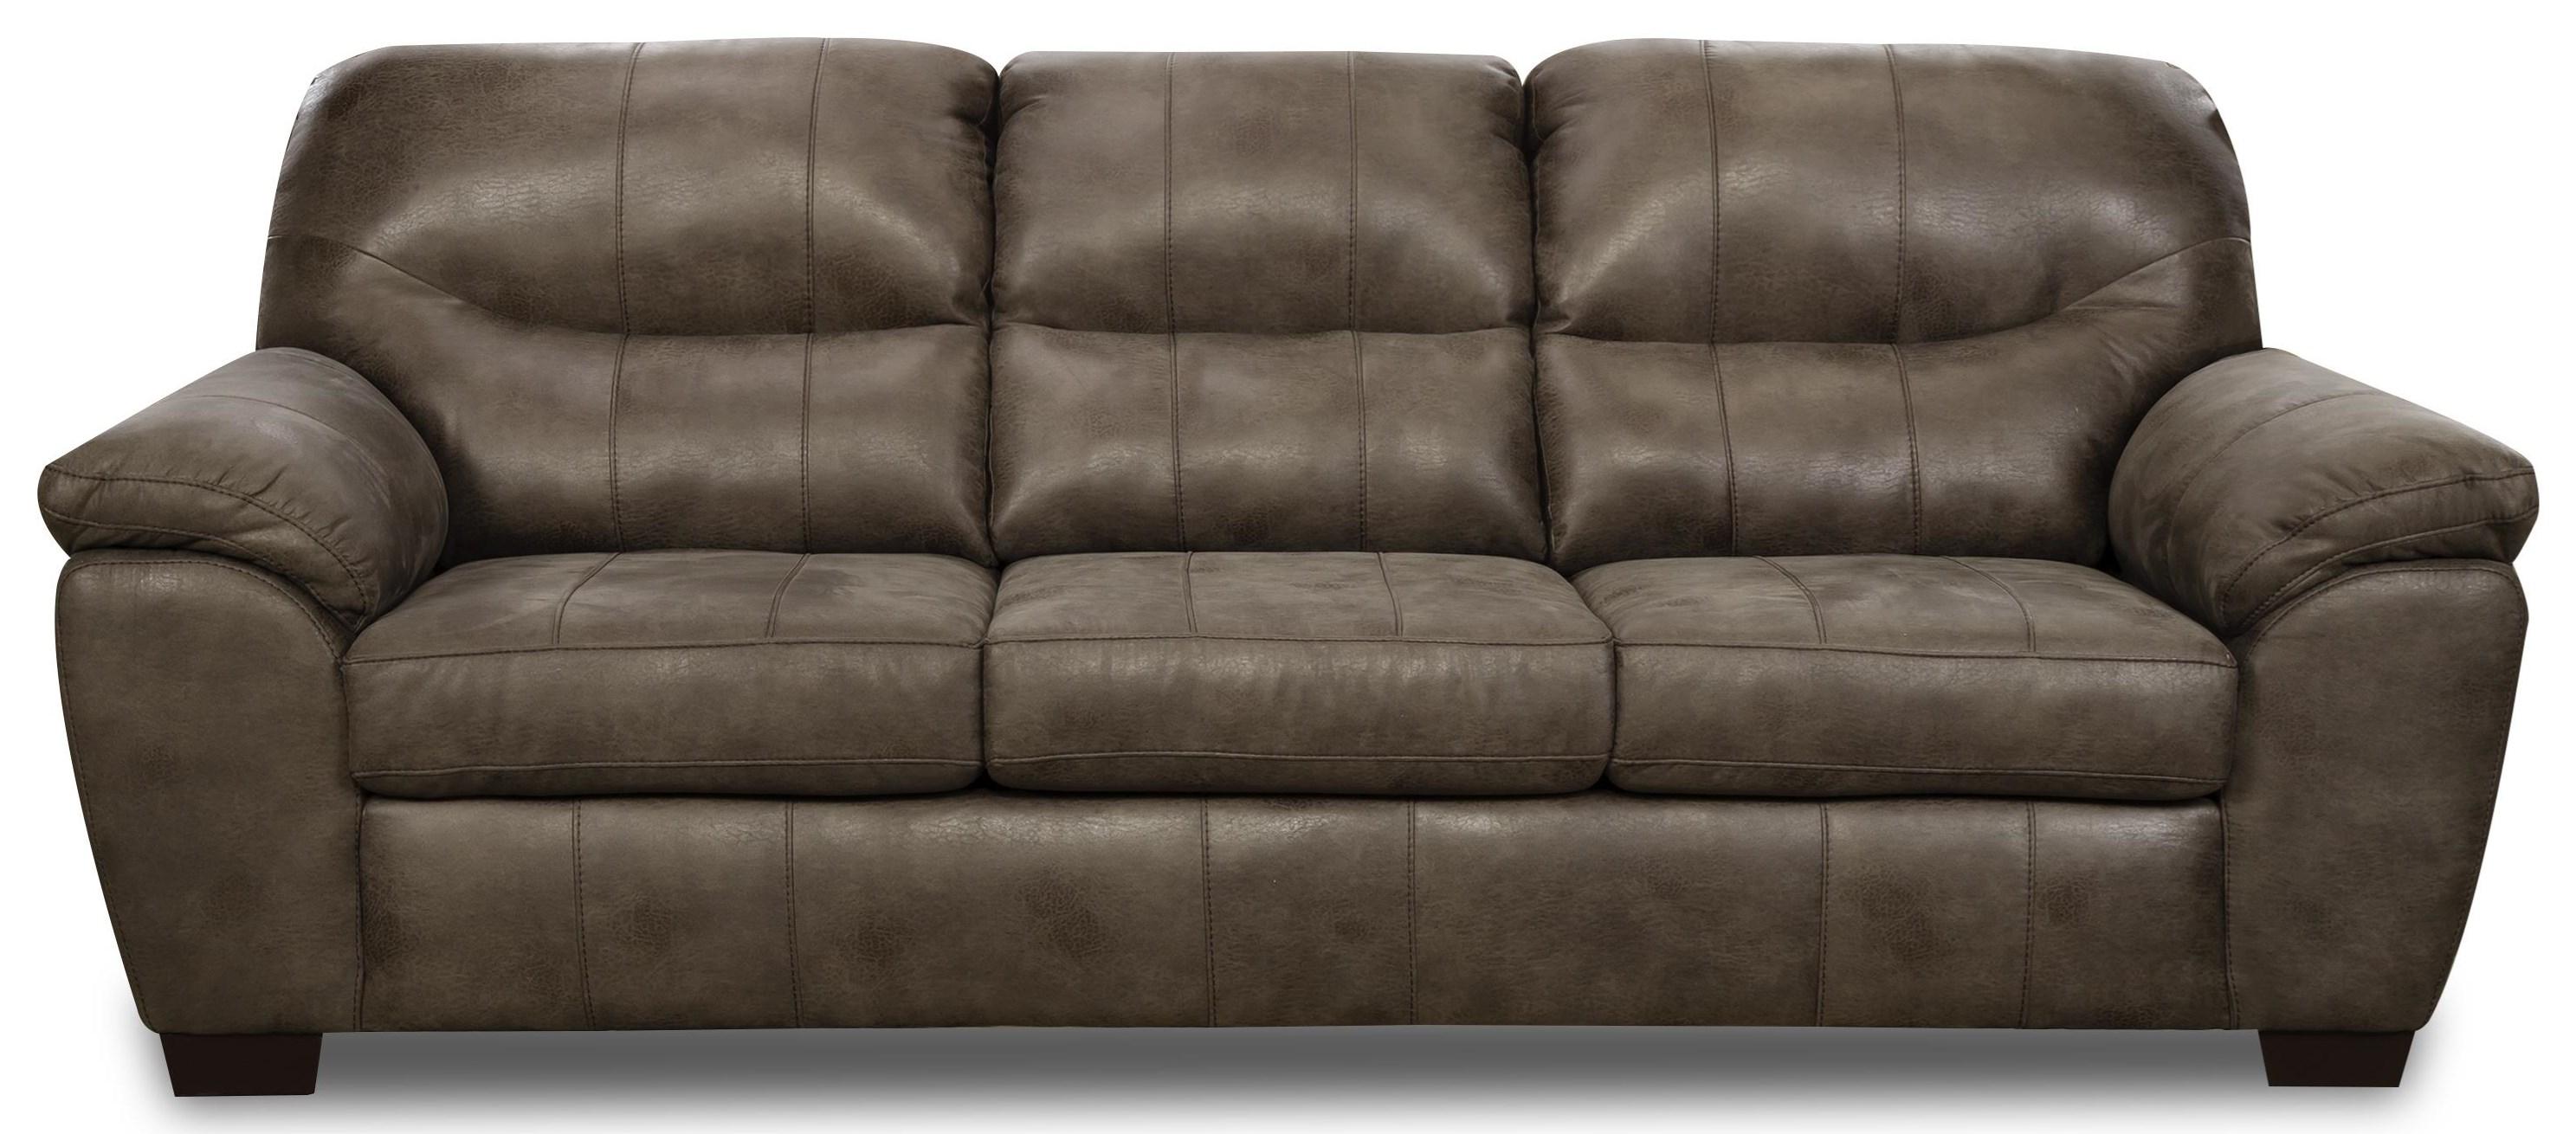 Denver Sofa by Behold Home at Darvin Furniture